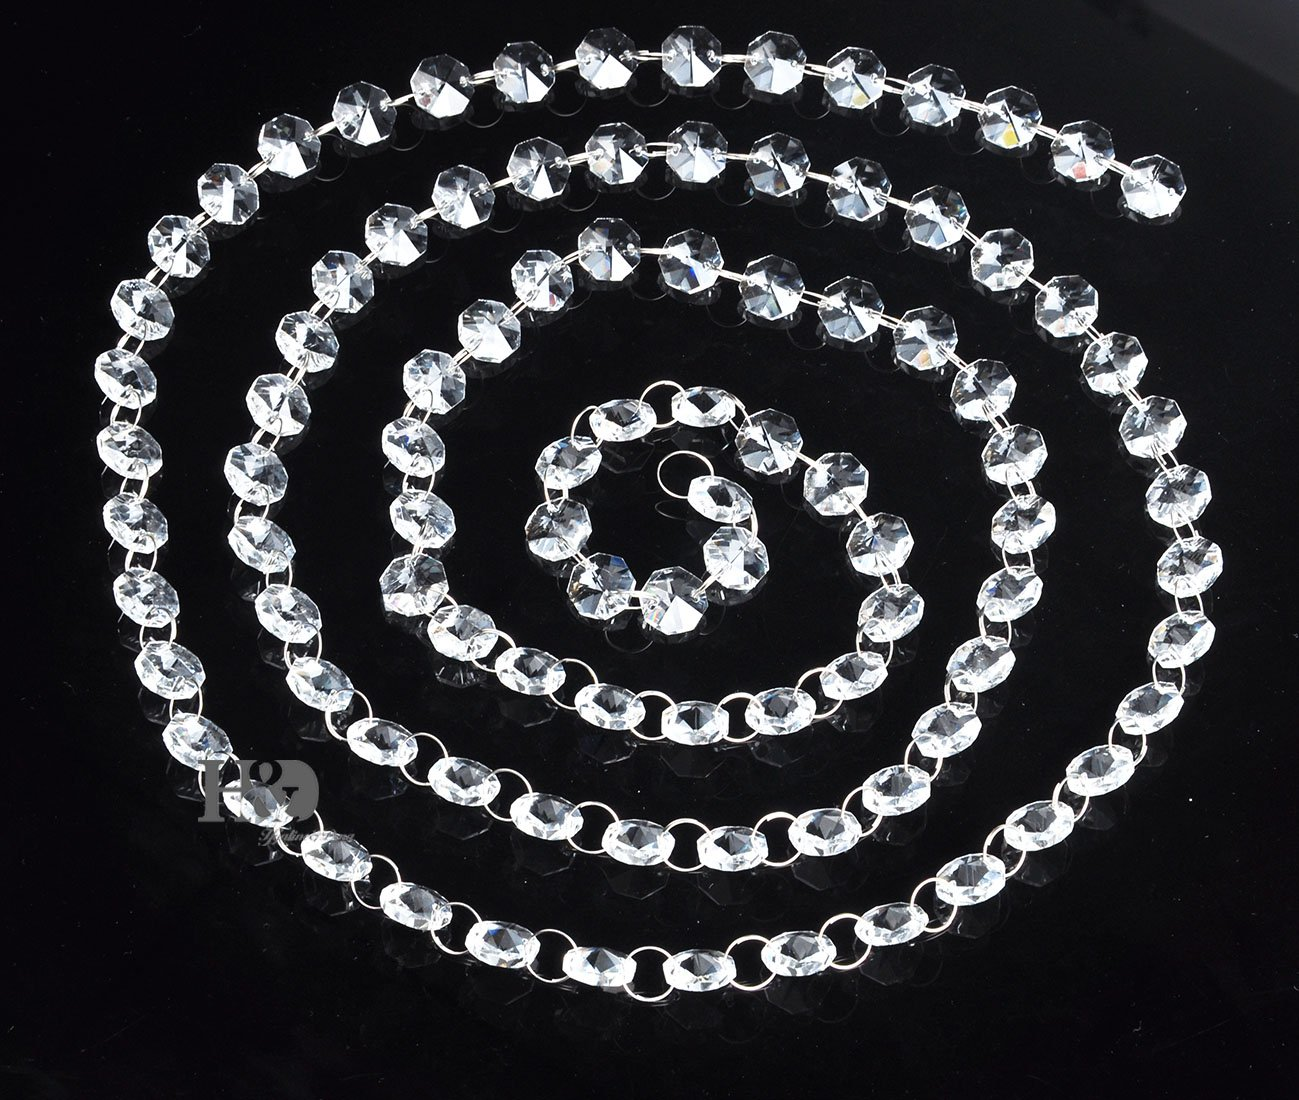 Amazon crystalprismworld 6ft crystal garland chandelier chain amazon crystalprismworld 6ft crystal garland chandelier chain c6019 home kitchen arubaitofo Choice Image